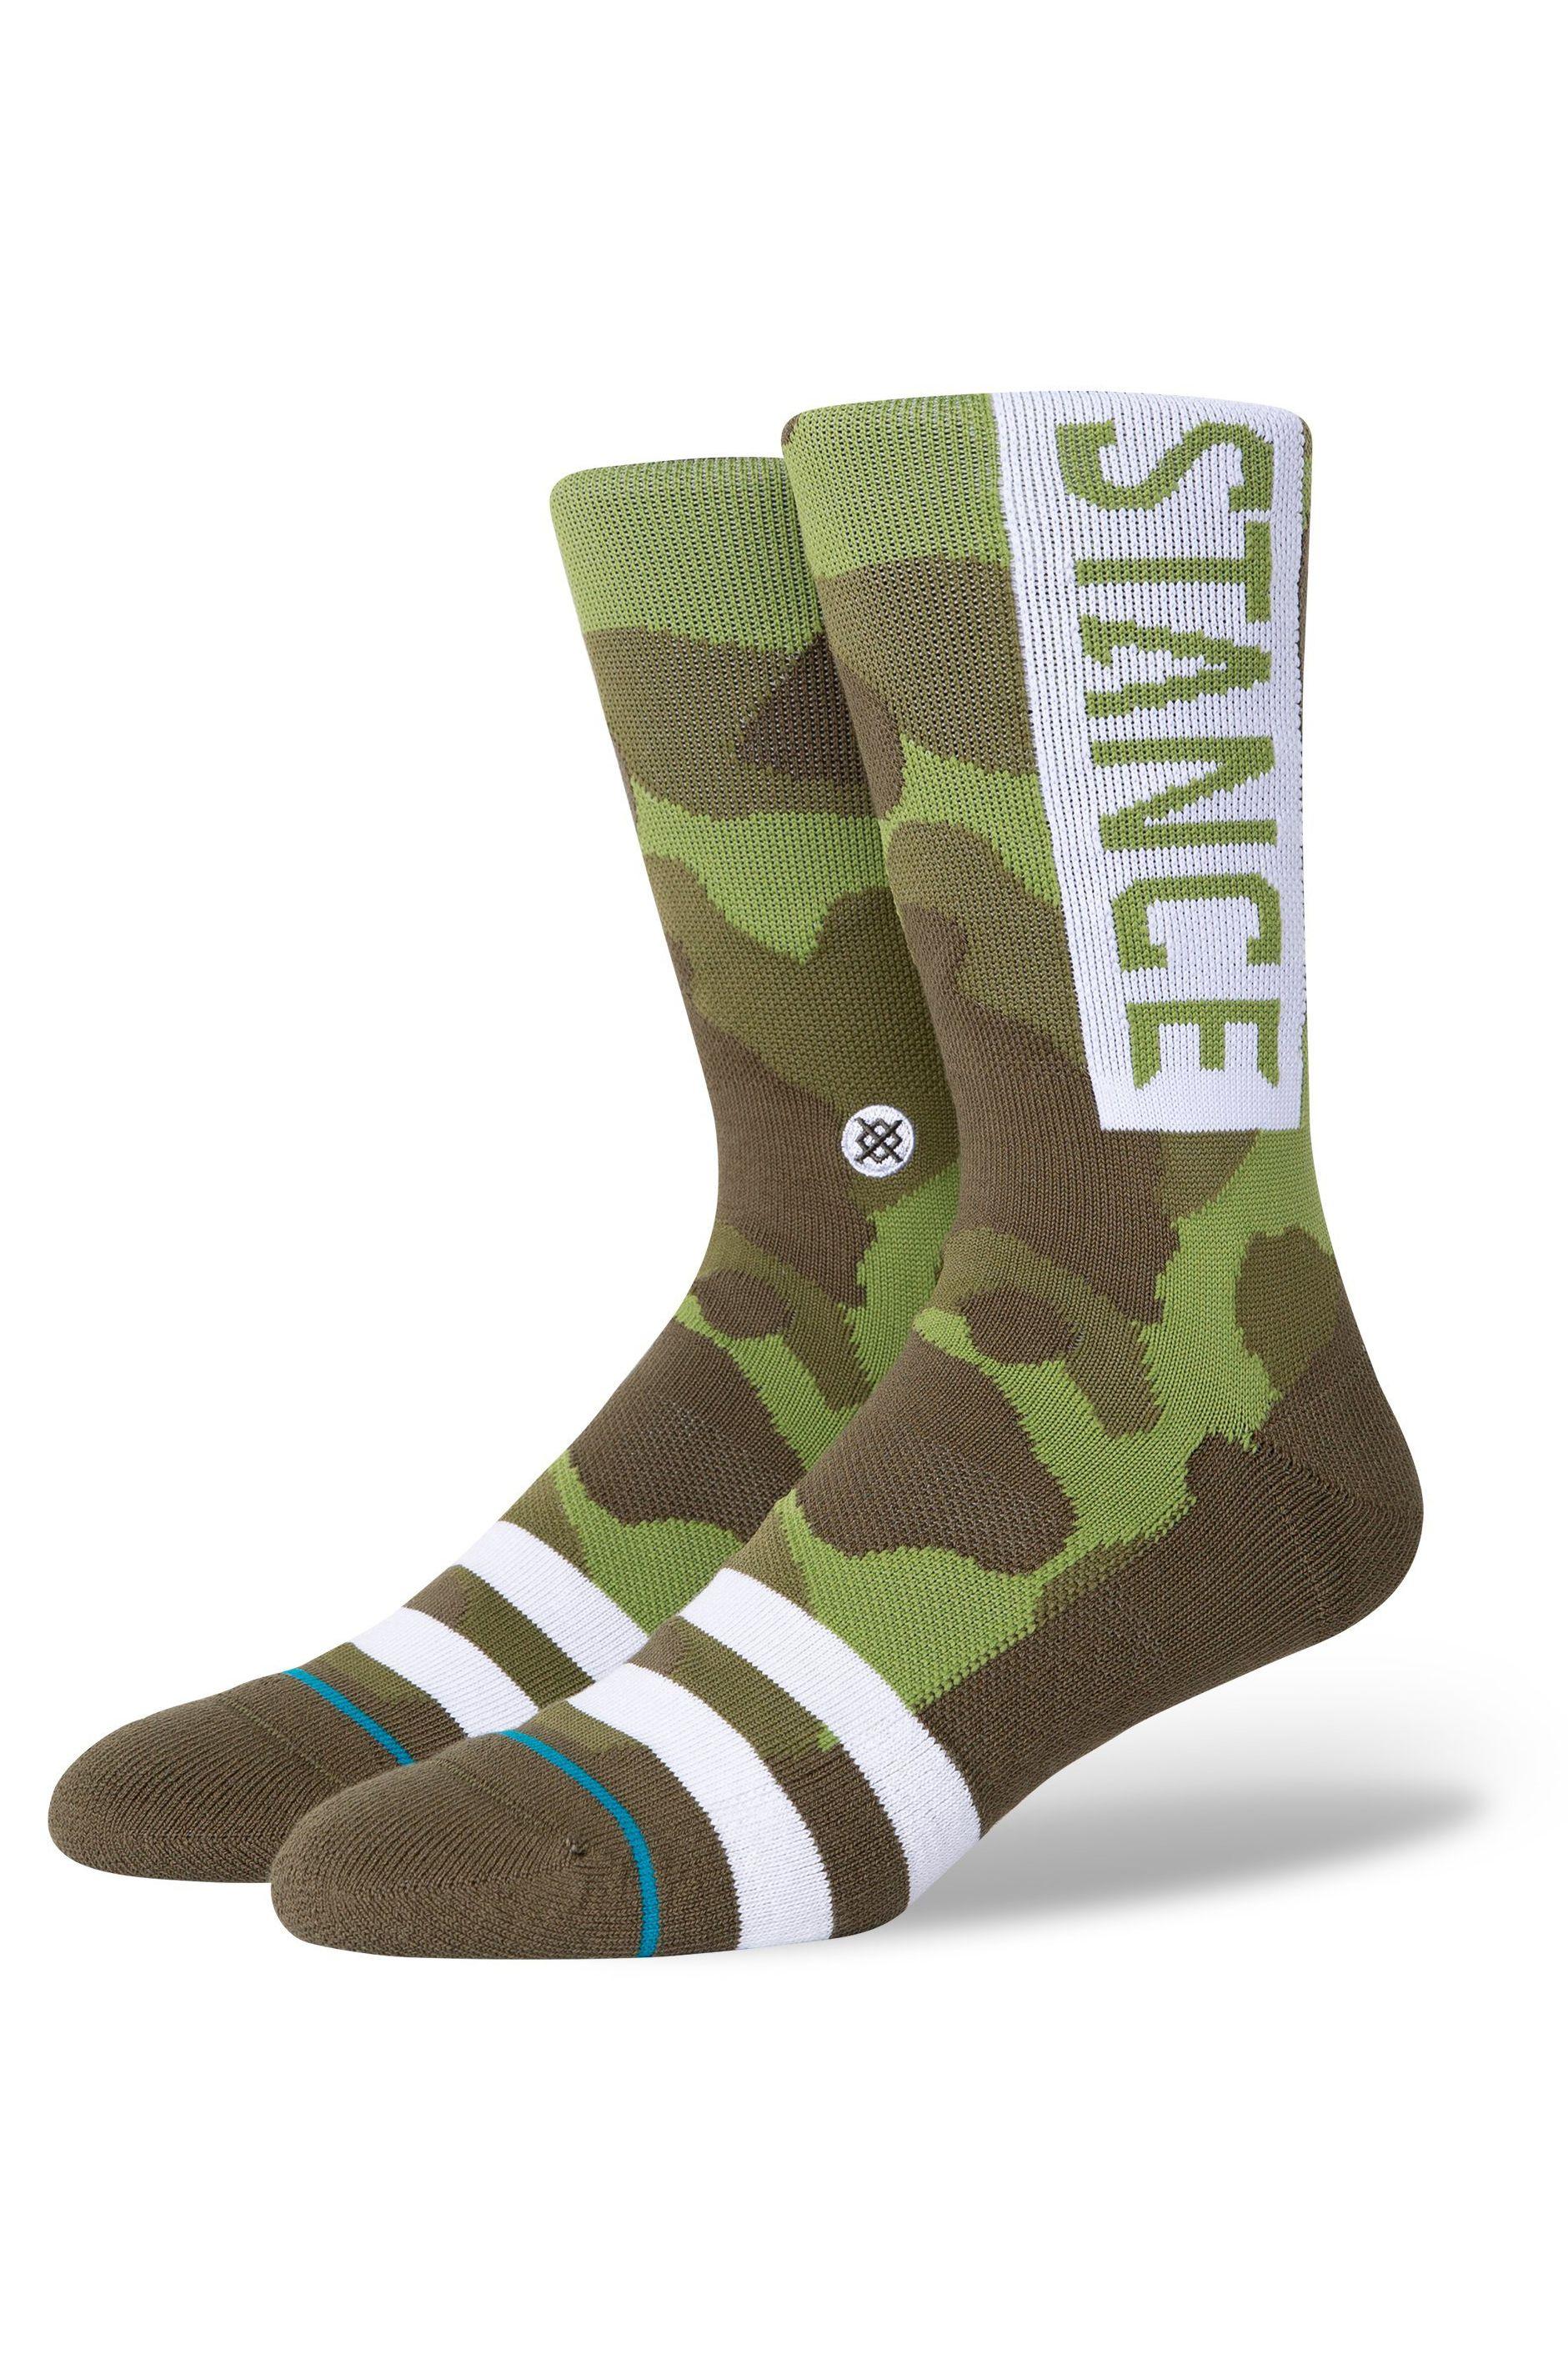 Stance Socks OG Camo